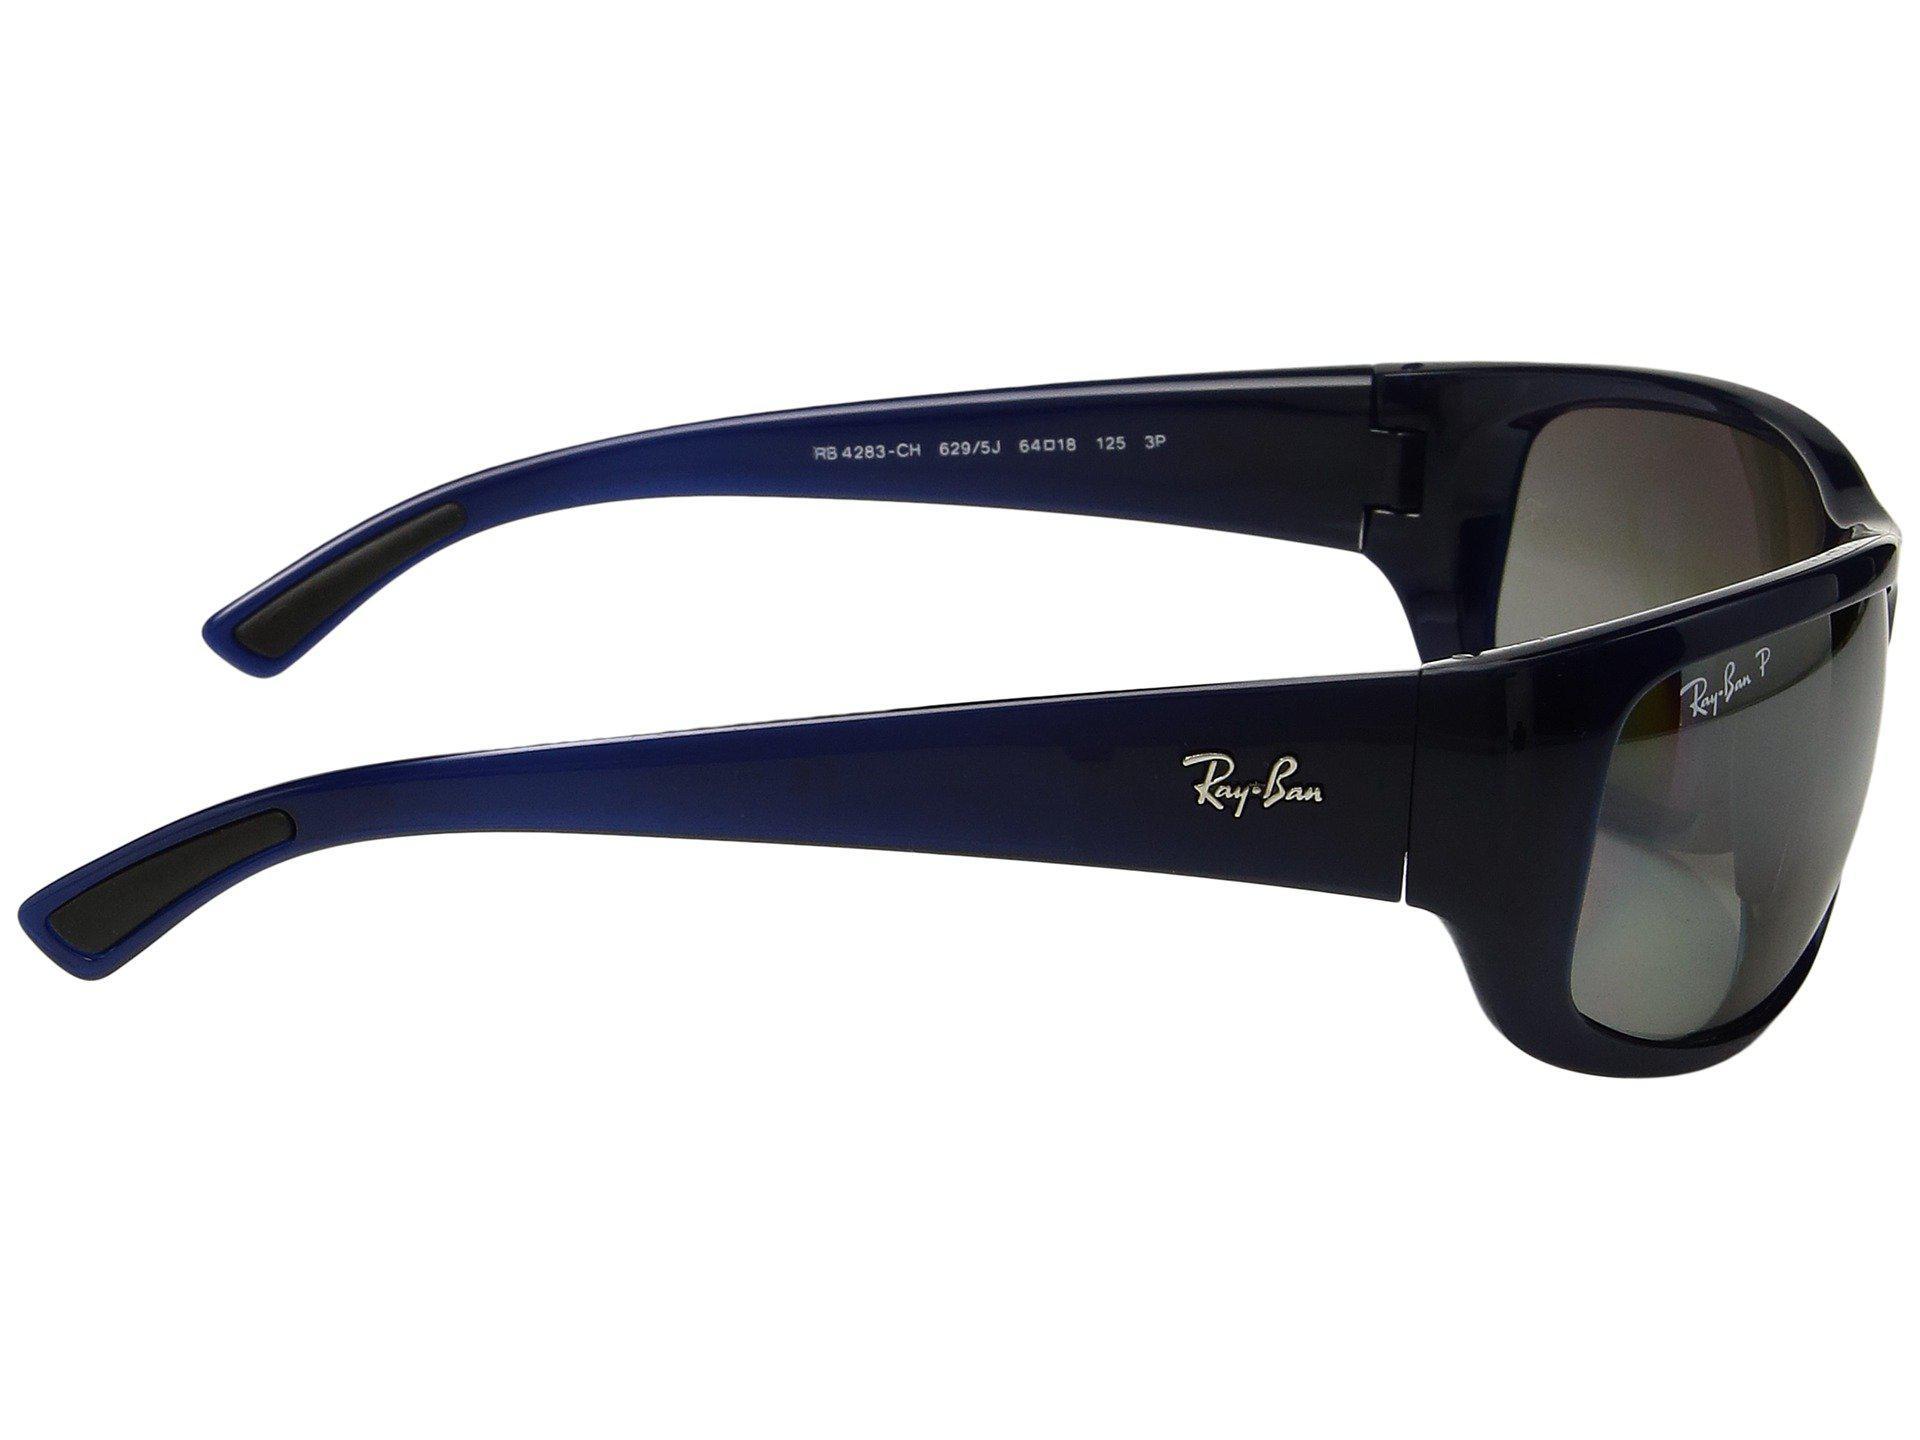 3a713cbf5a Ray-Ban - Rb4283ch 64mm (blue polarized Silver Mirror Chromance) Fashion  Sunglasses. View fullscreen